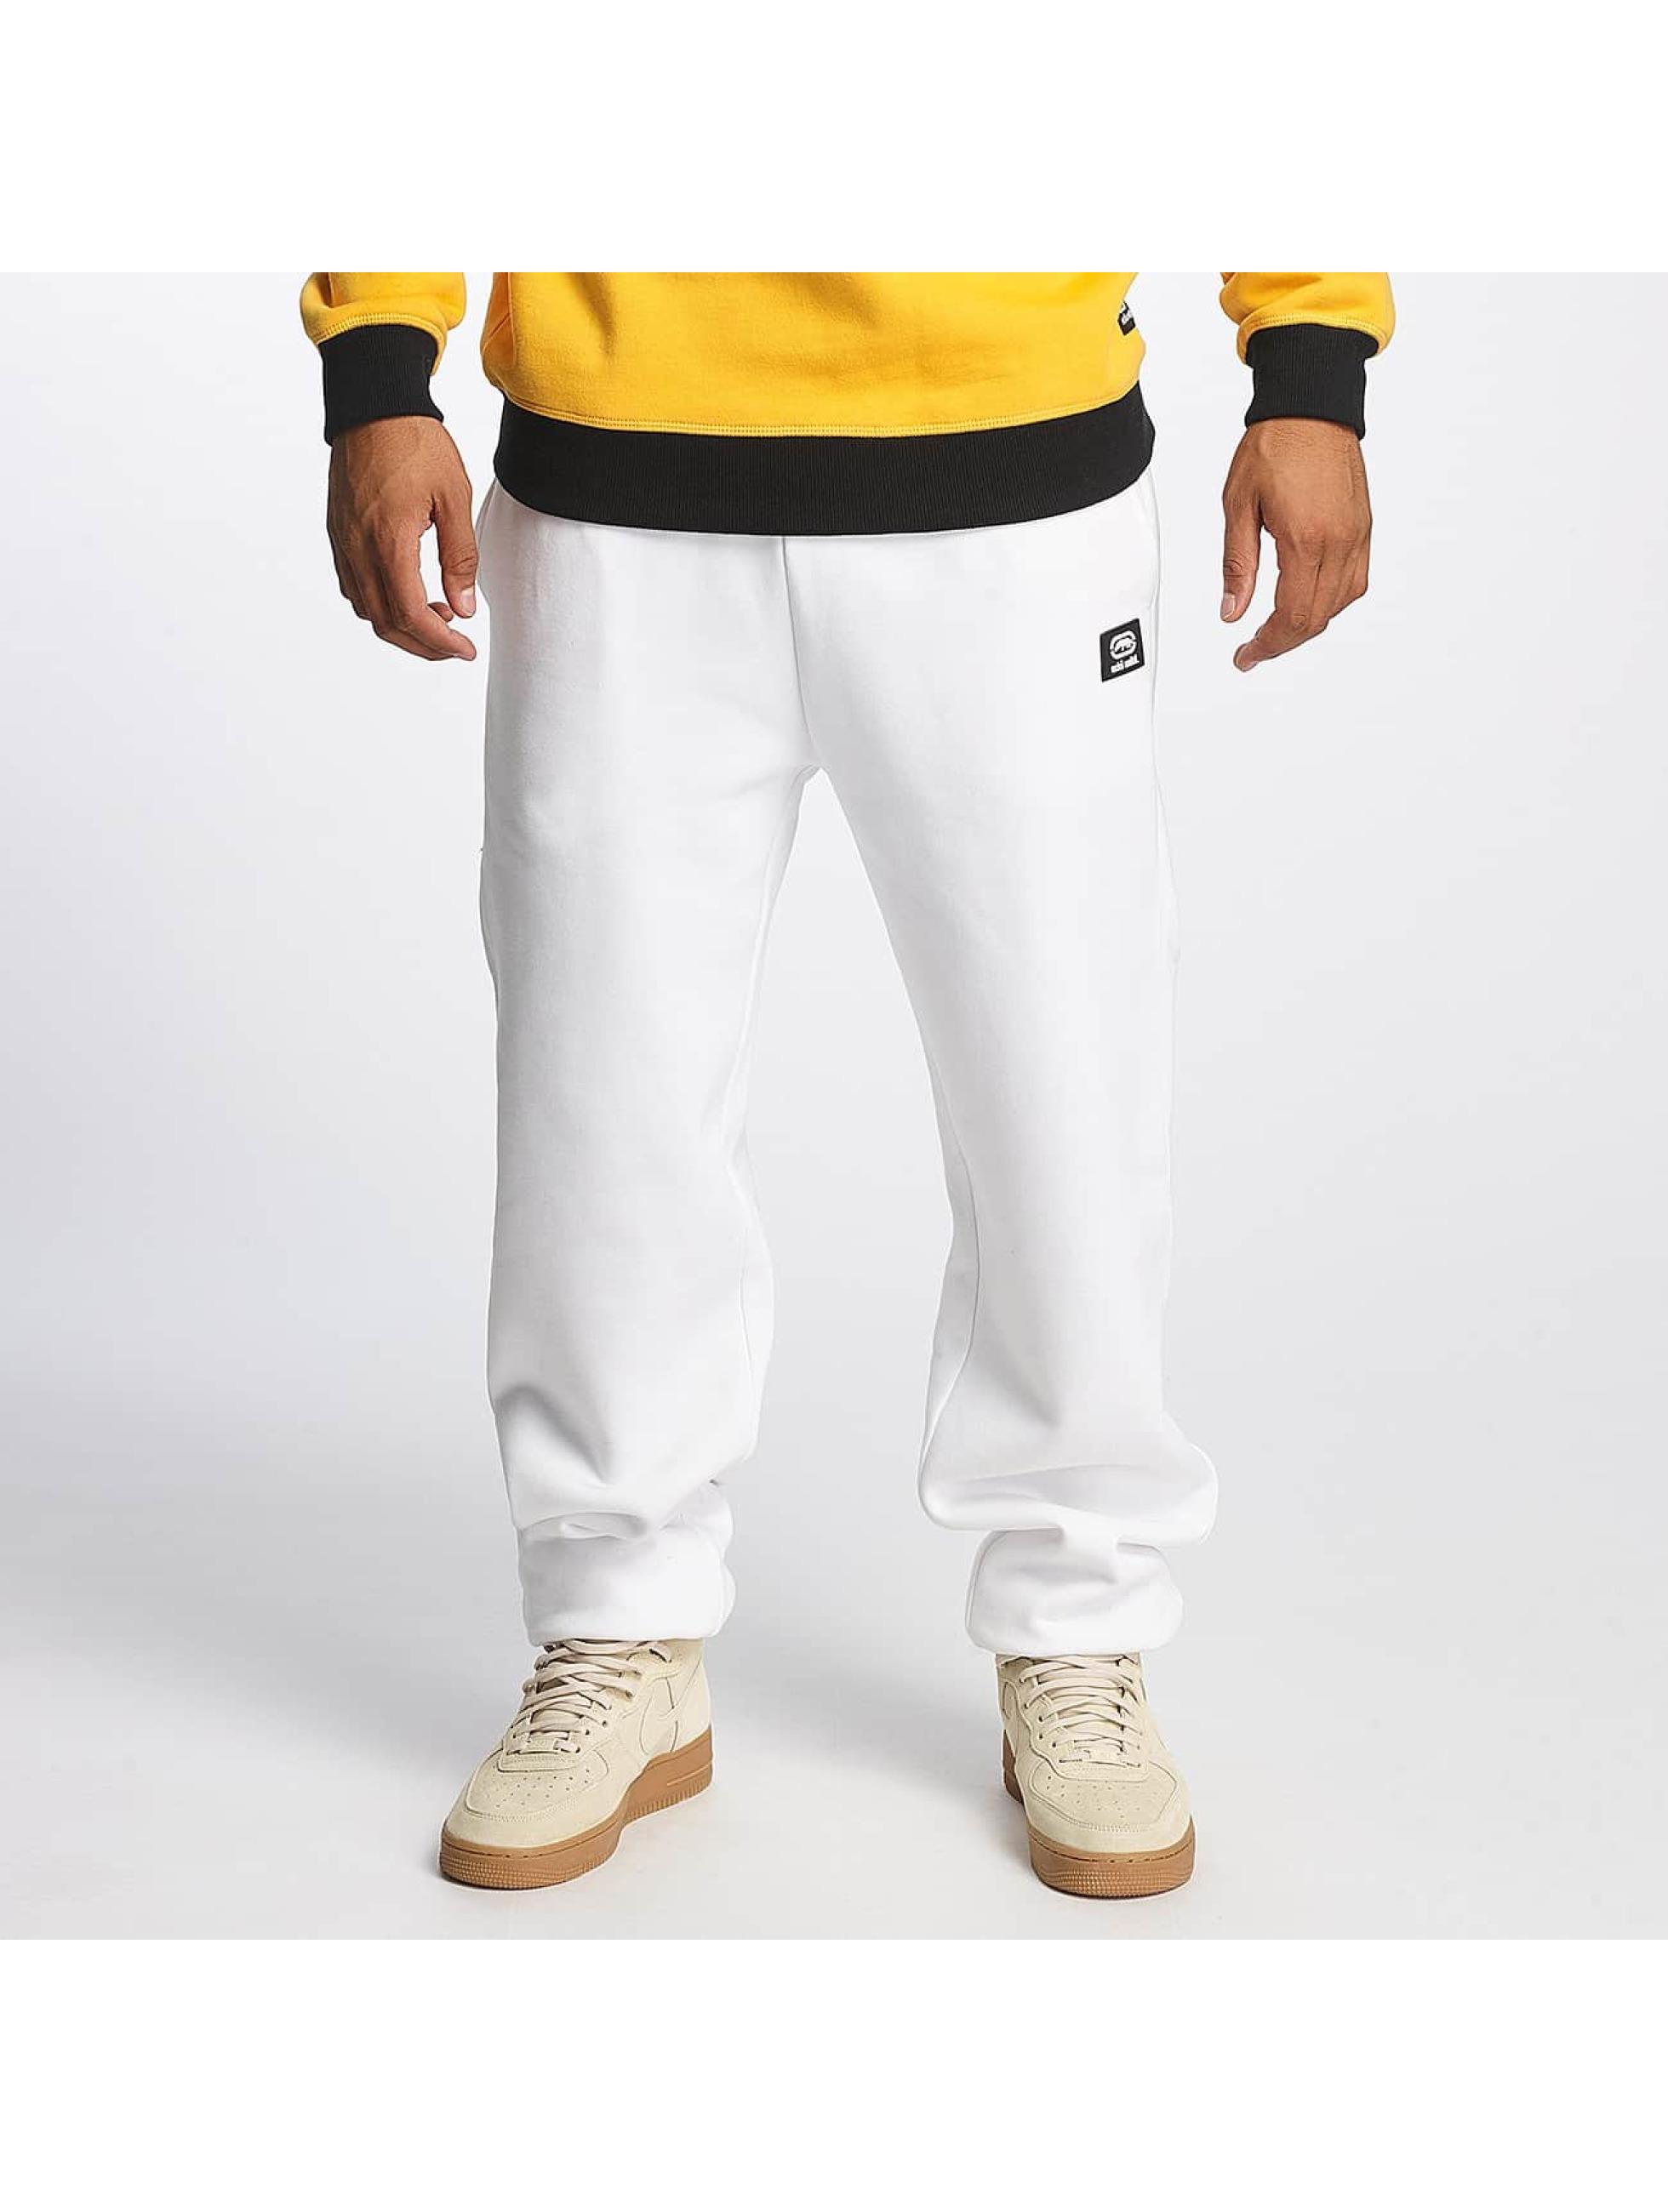 Ecko Unltd. / Sweat Pant SkeletonCoast in white XL